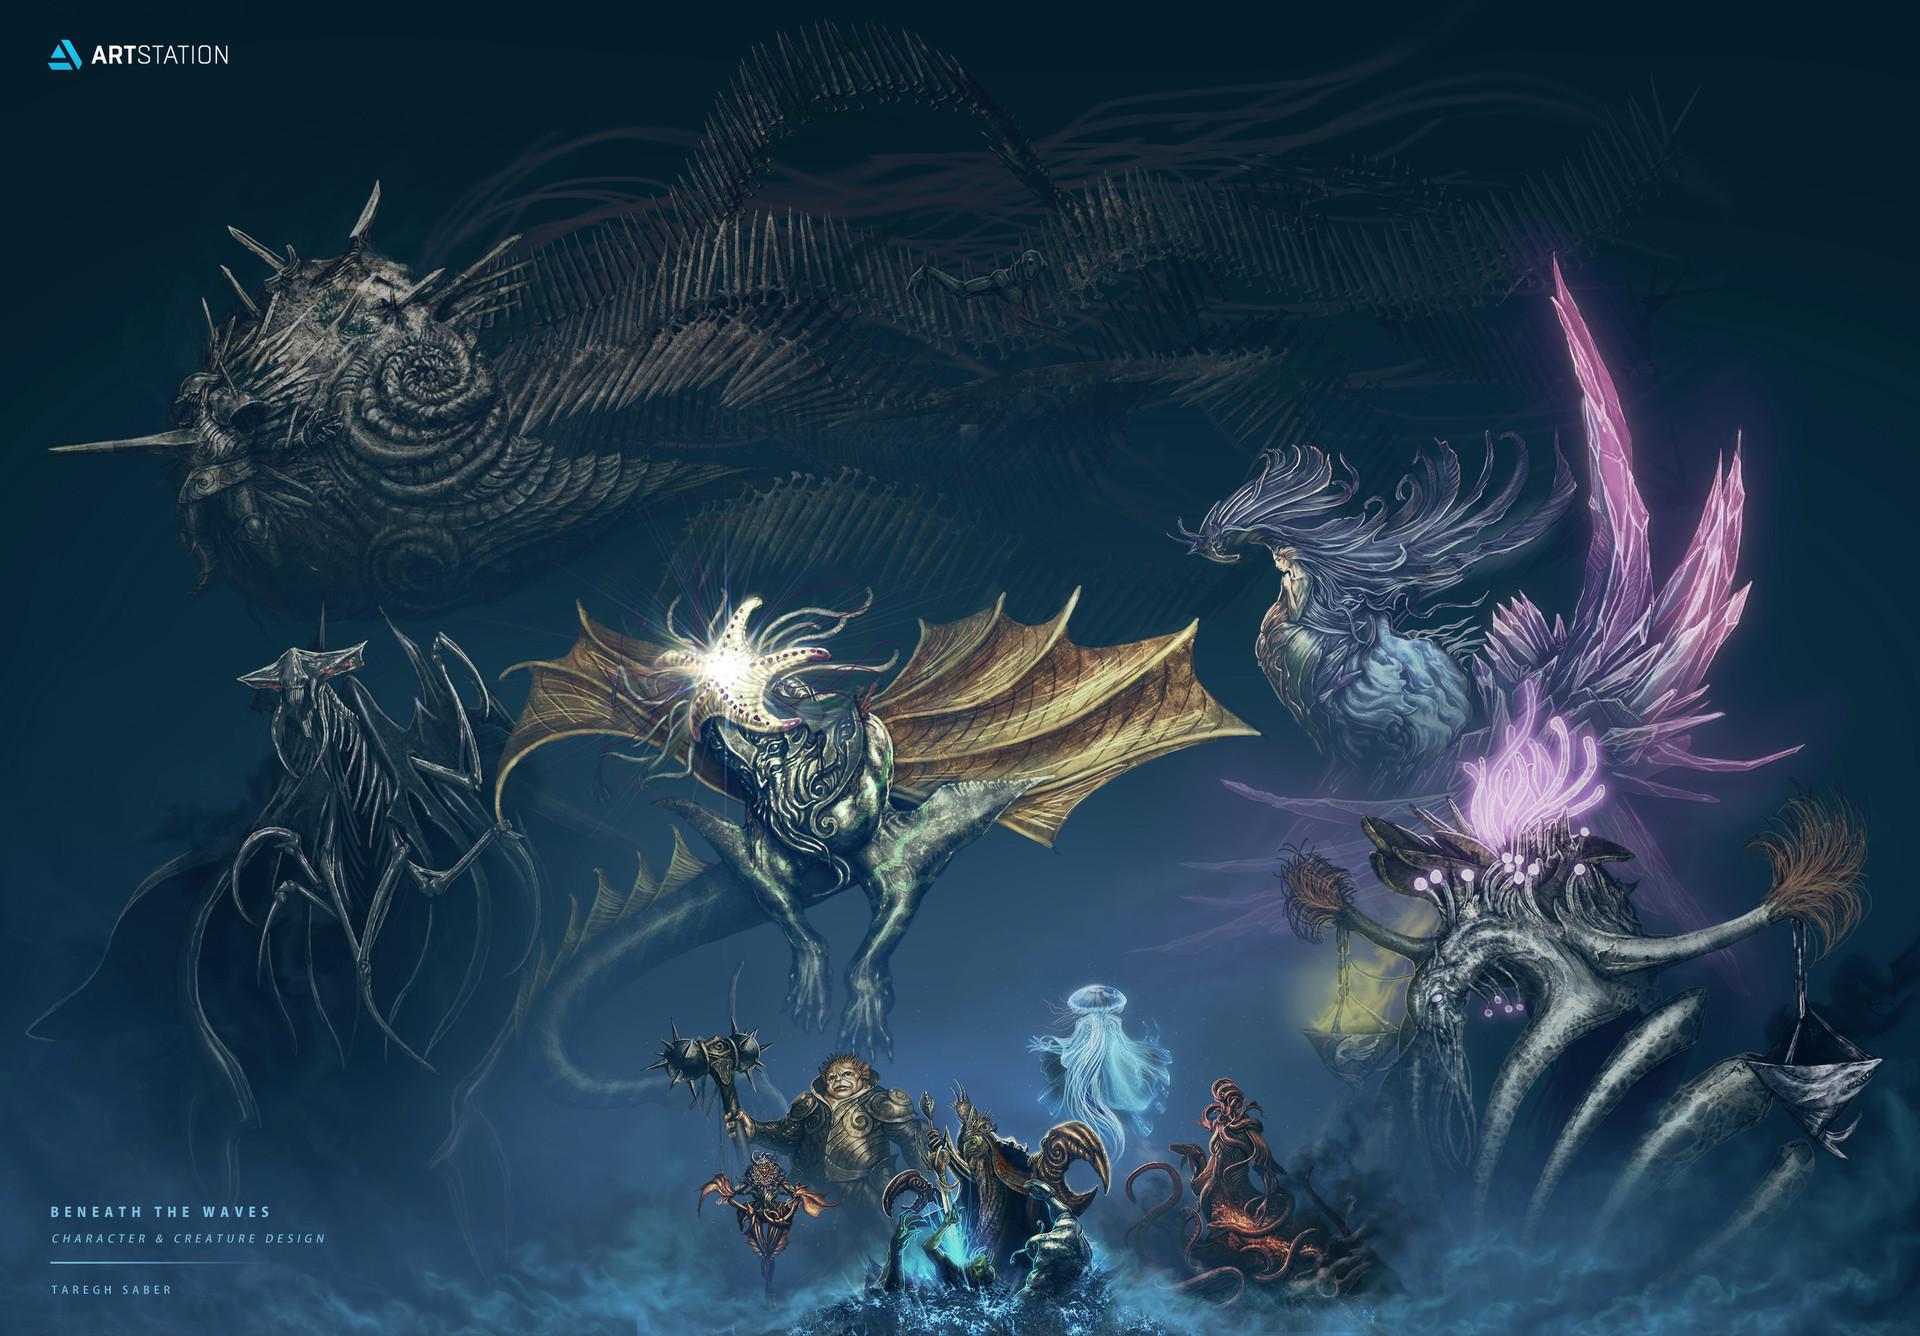 taregh-saber-10-characters-creatures-text